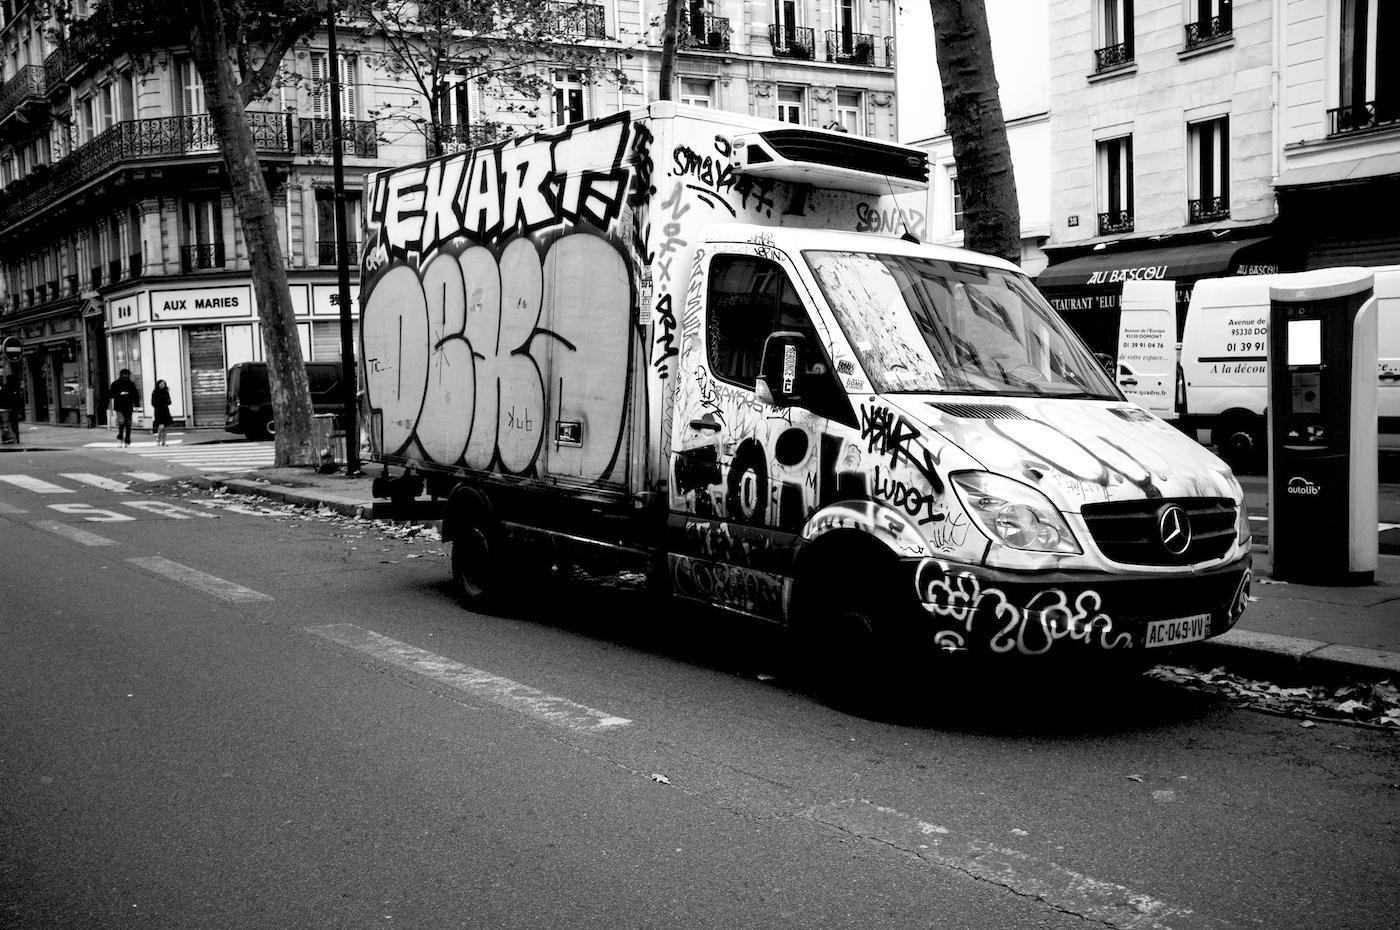 161126-marcvallee-Graffiti-Trucks-26.11.16.0031